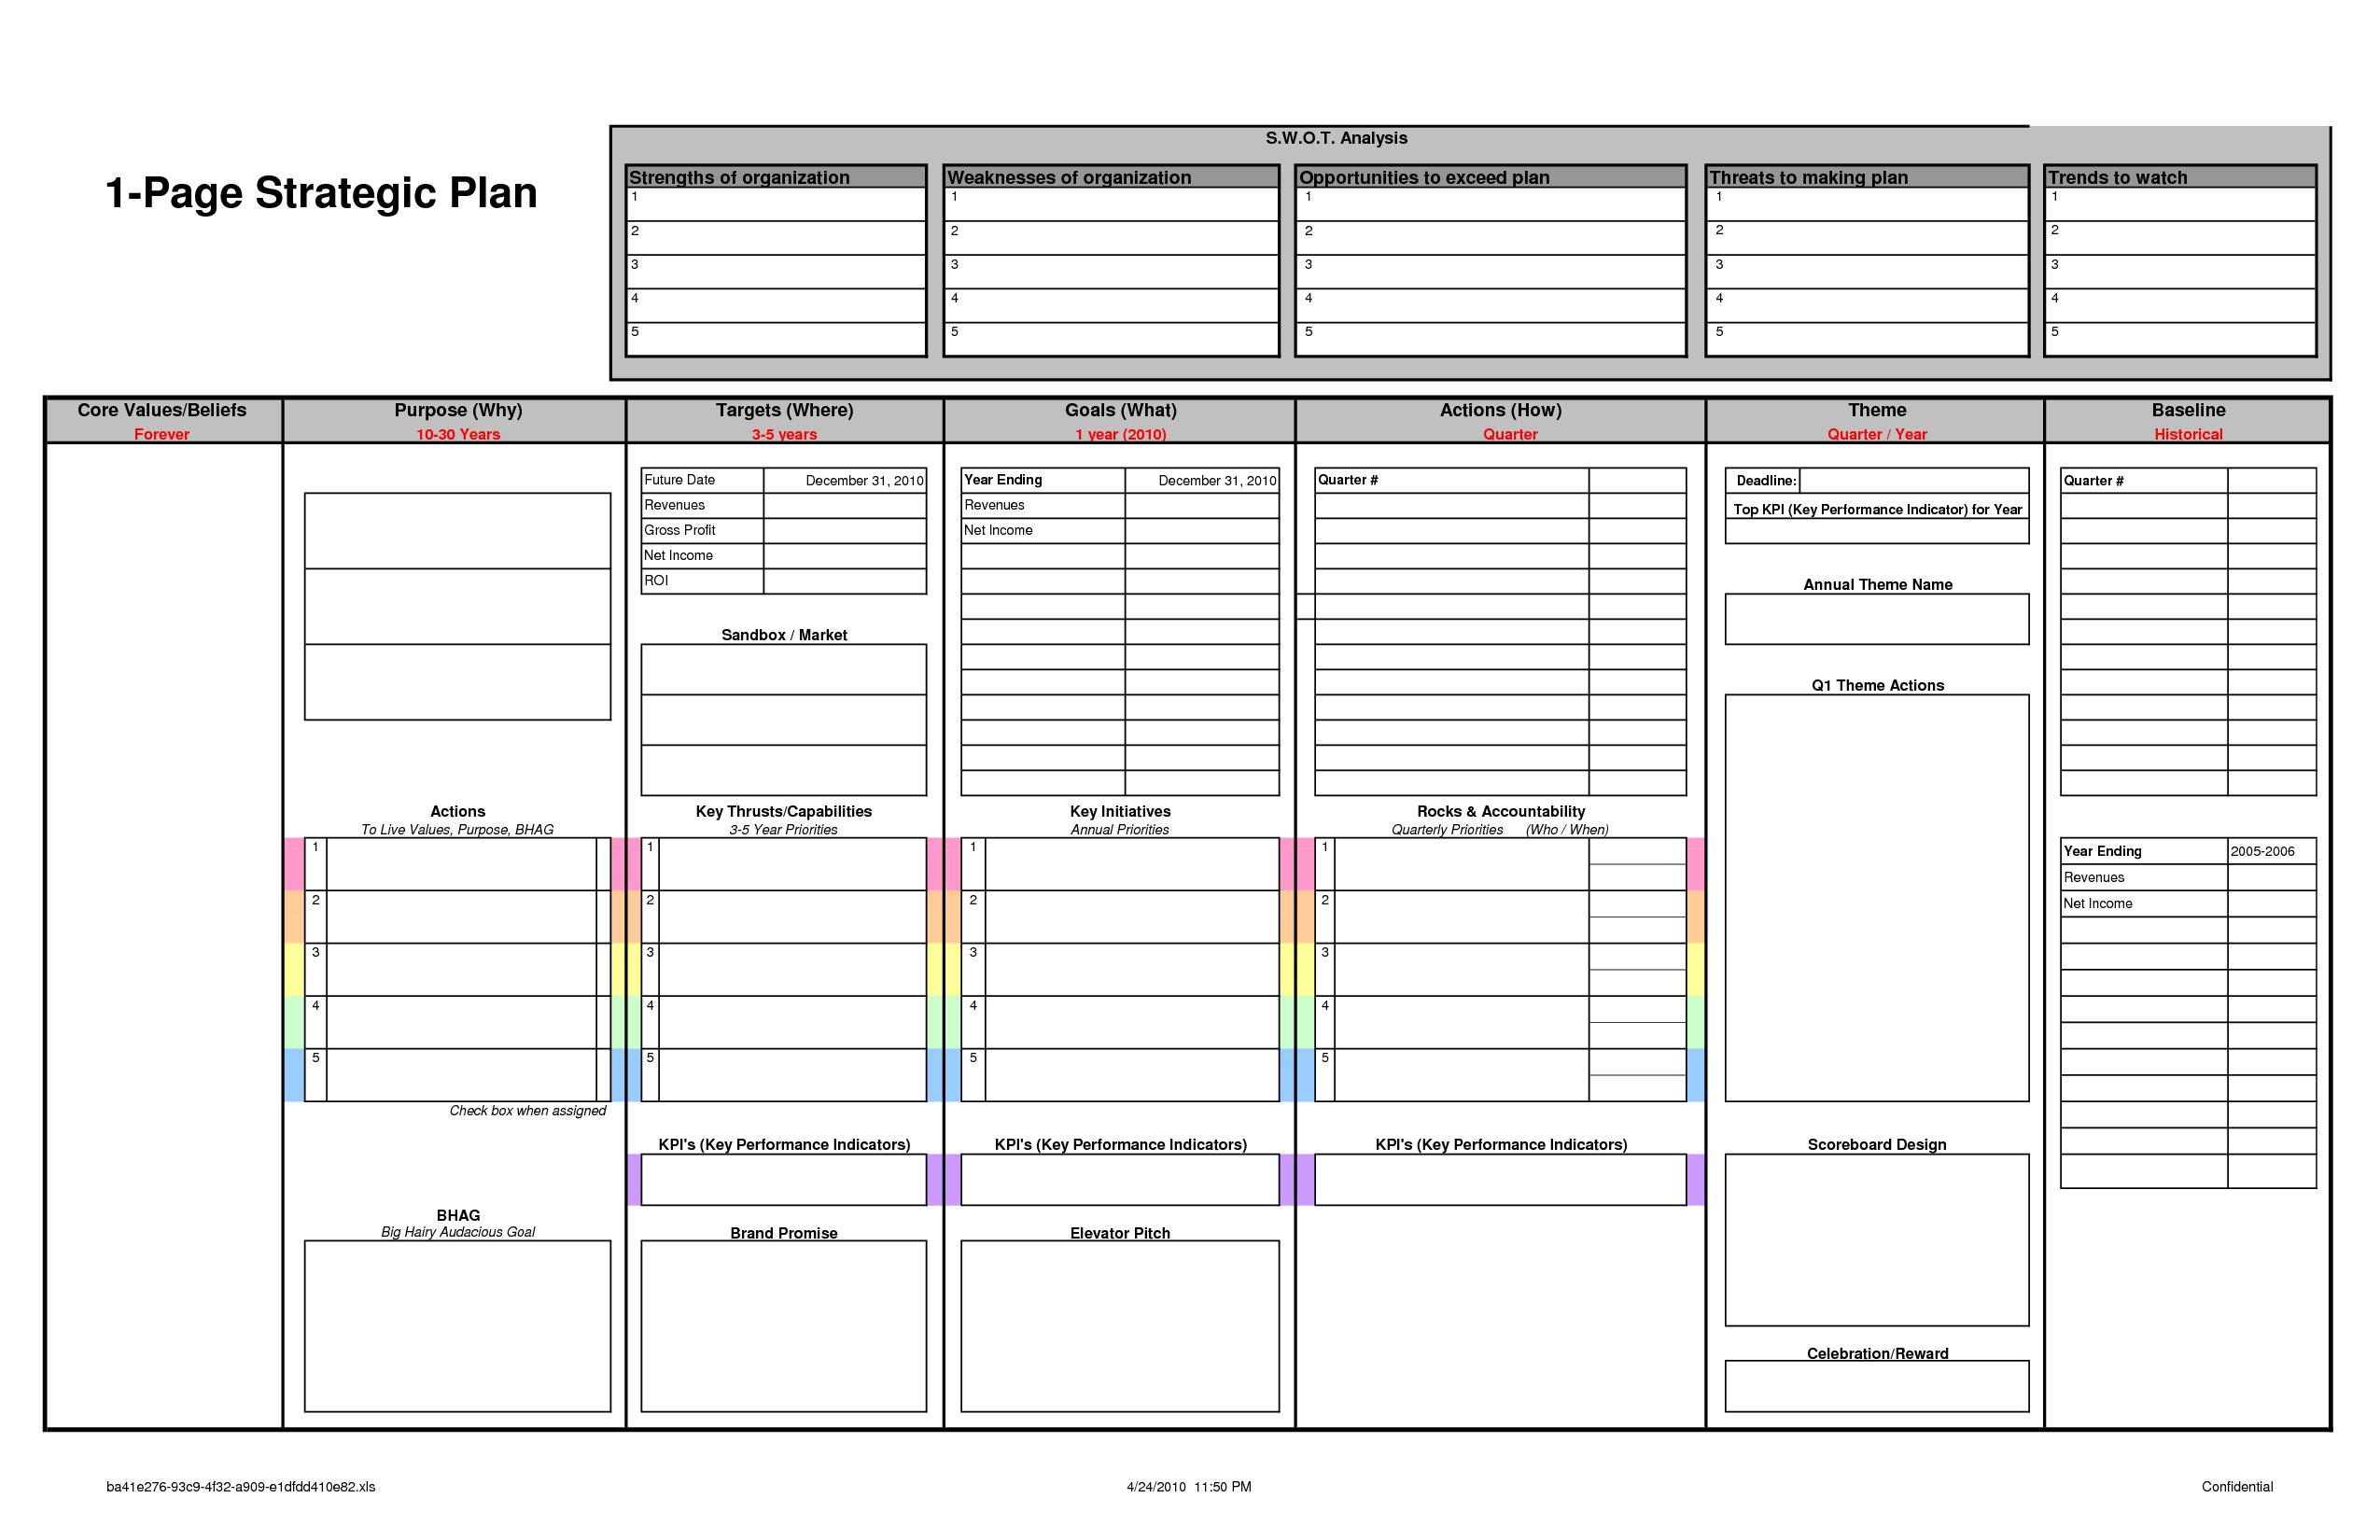 Rockefeller Habits One Page Strategic Plan